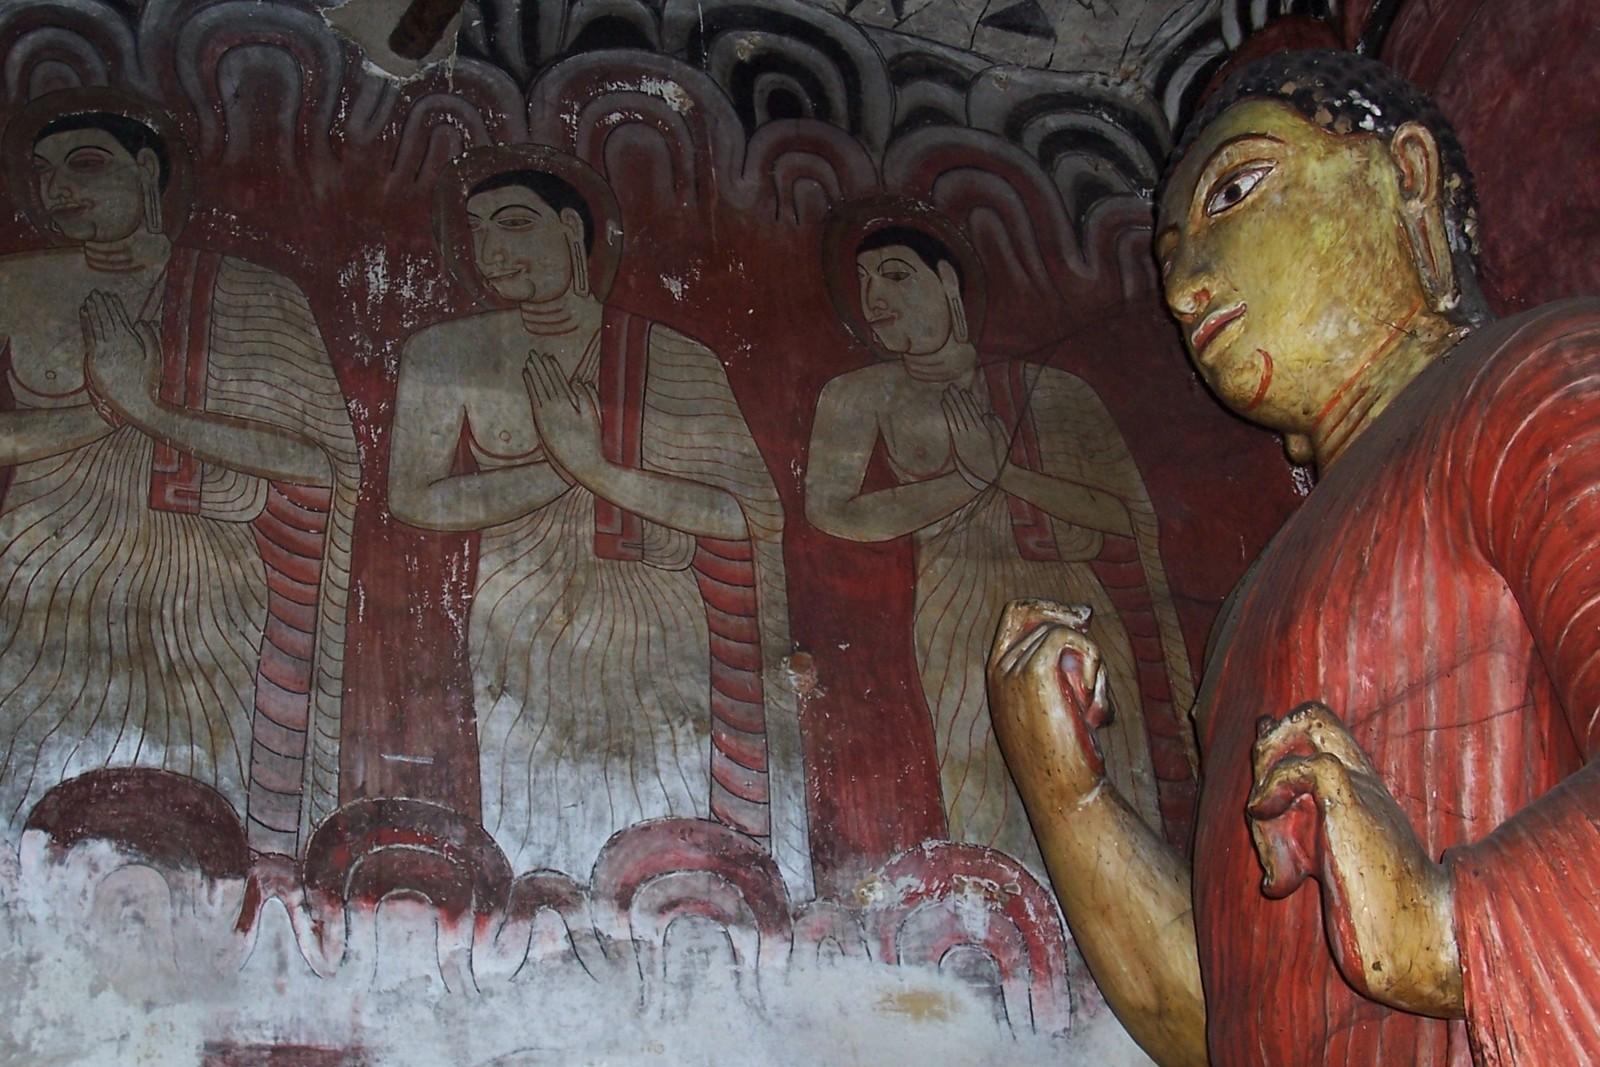 Höhlentempel von Dambulla - 2. Höhle